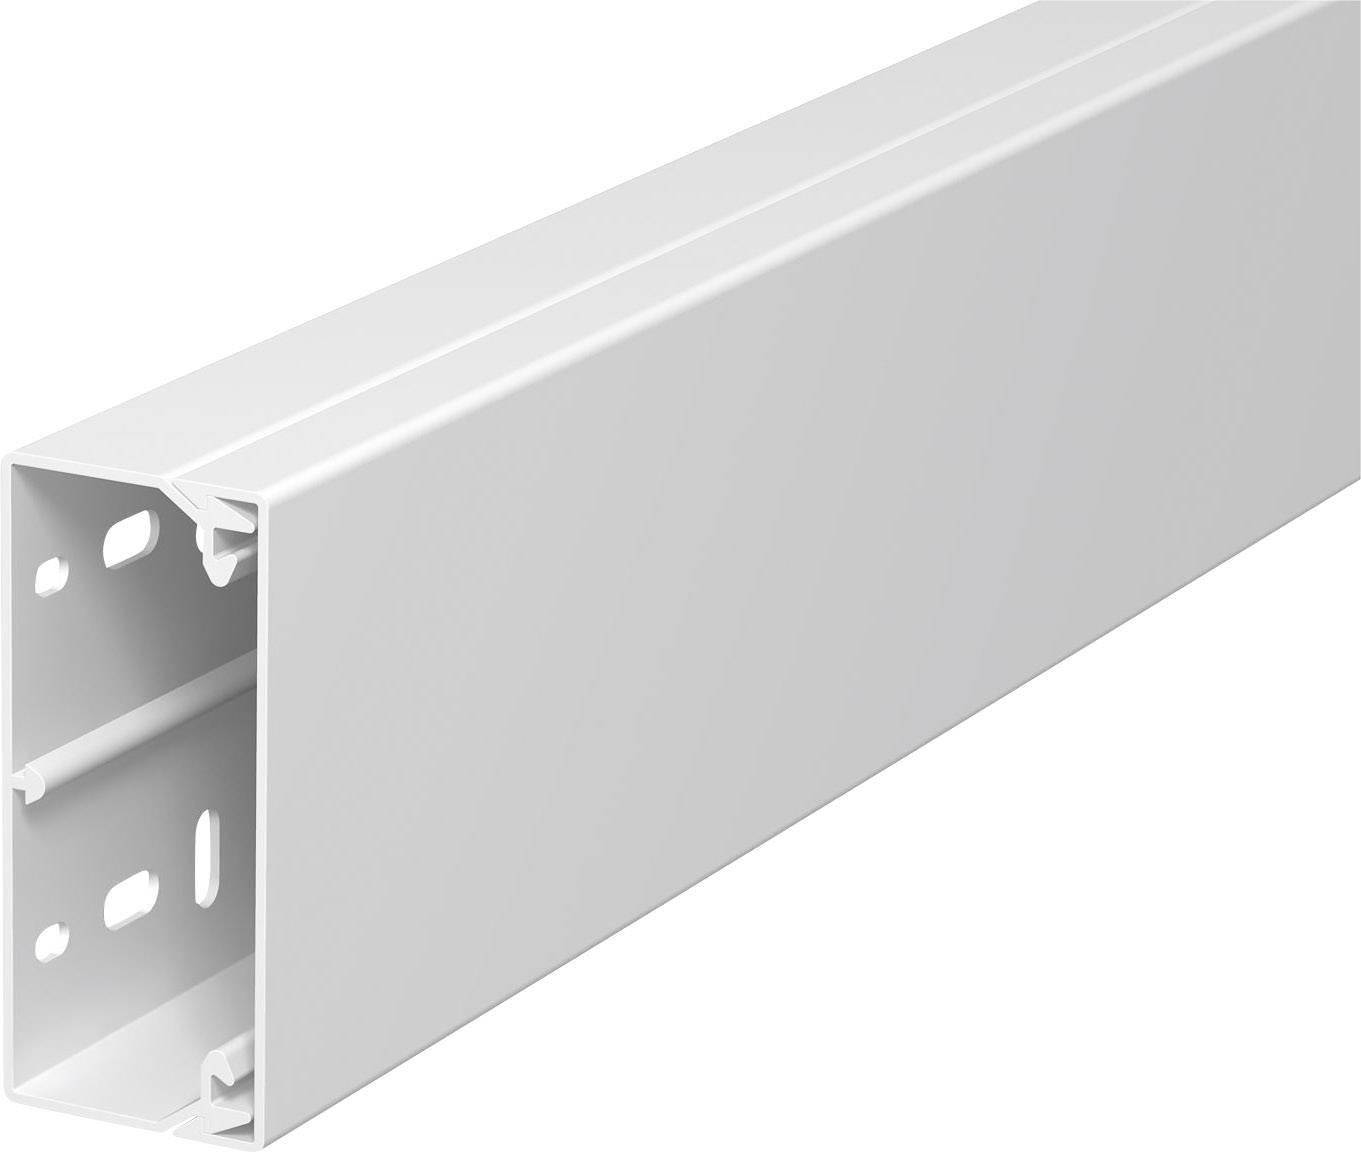 Elektroinstalační lišta s krytem OBO Bettermann, 6191142, 40 x 90 mm, 2 m, bílá